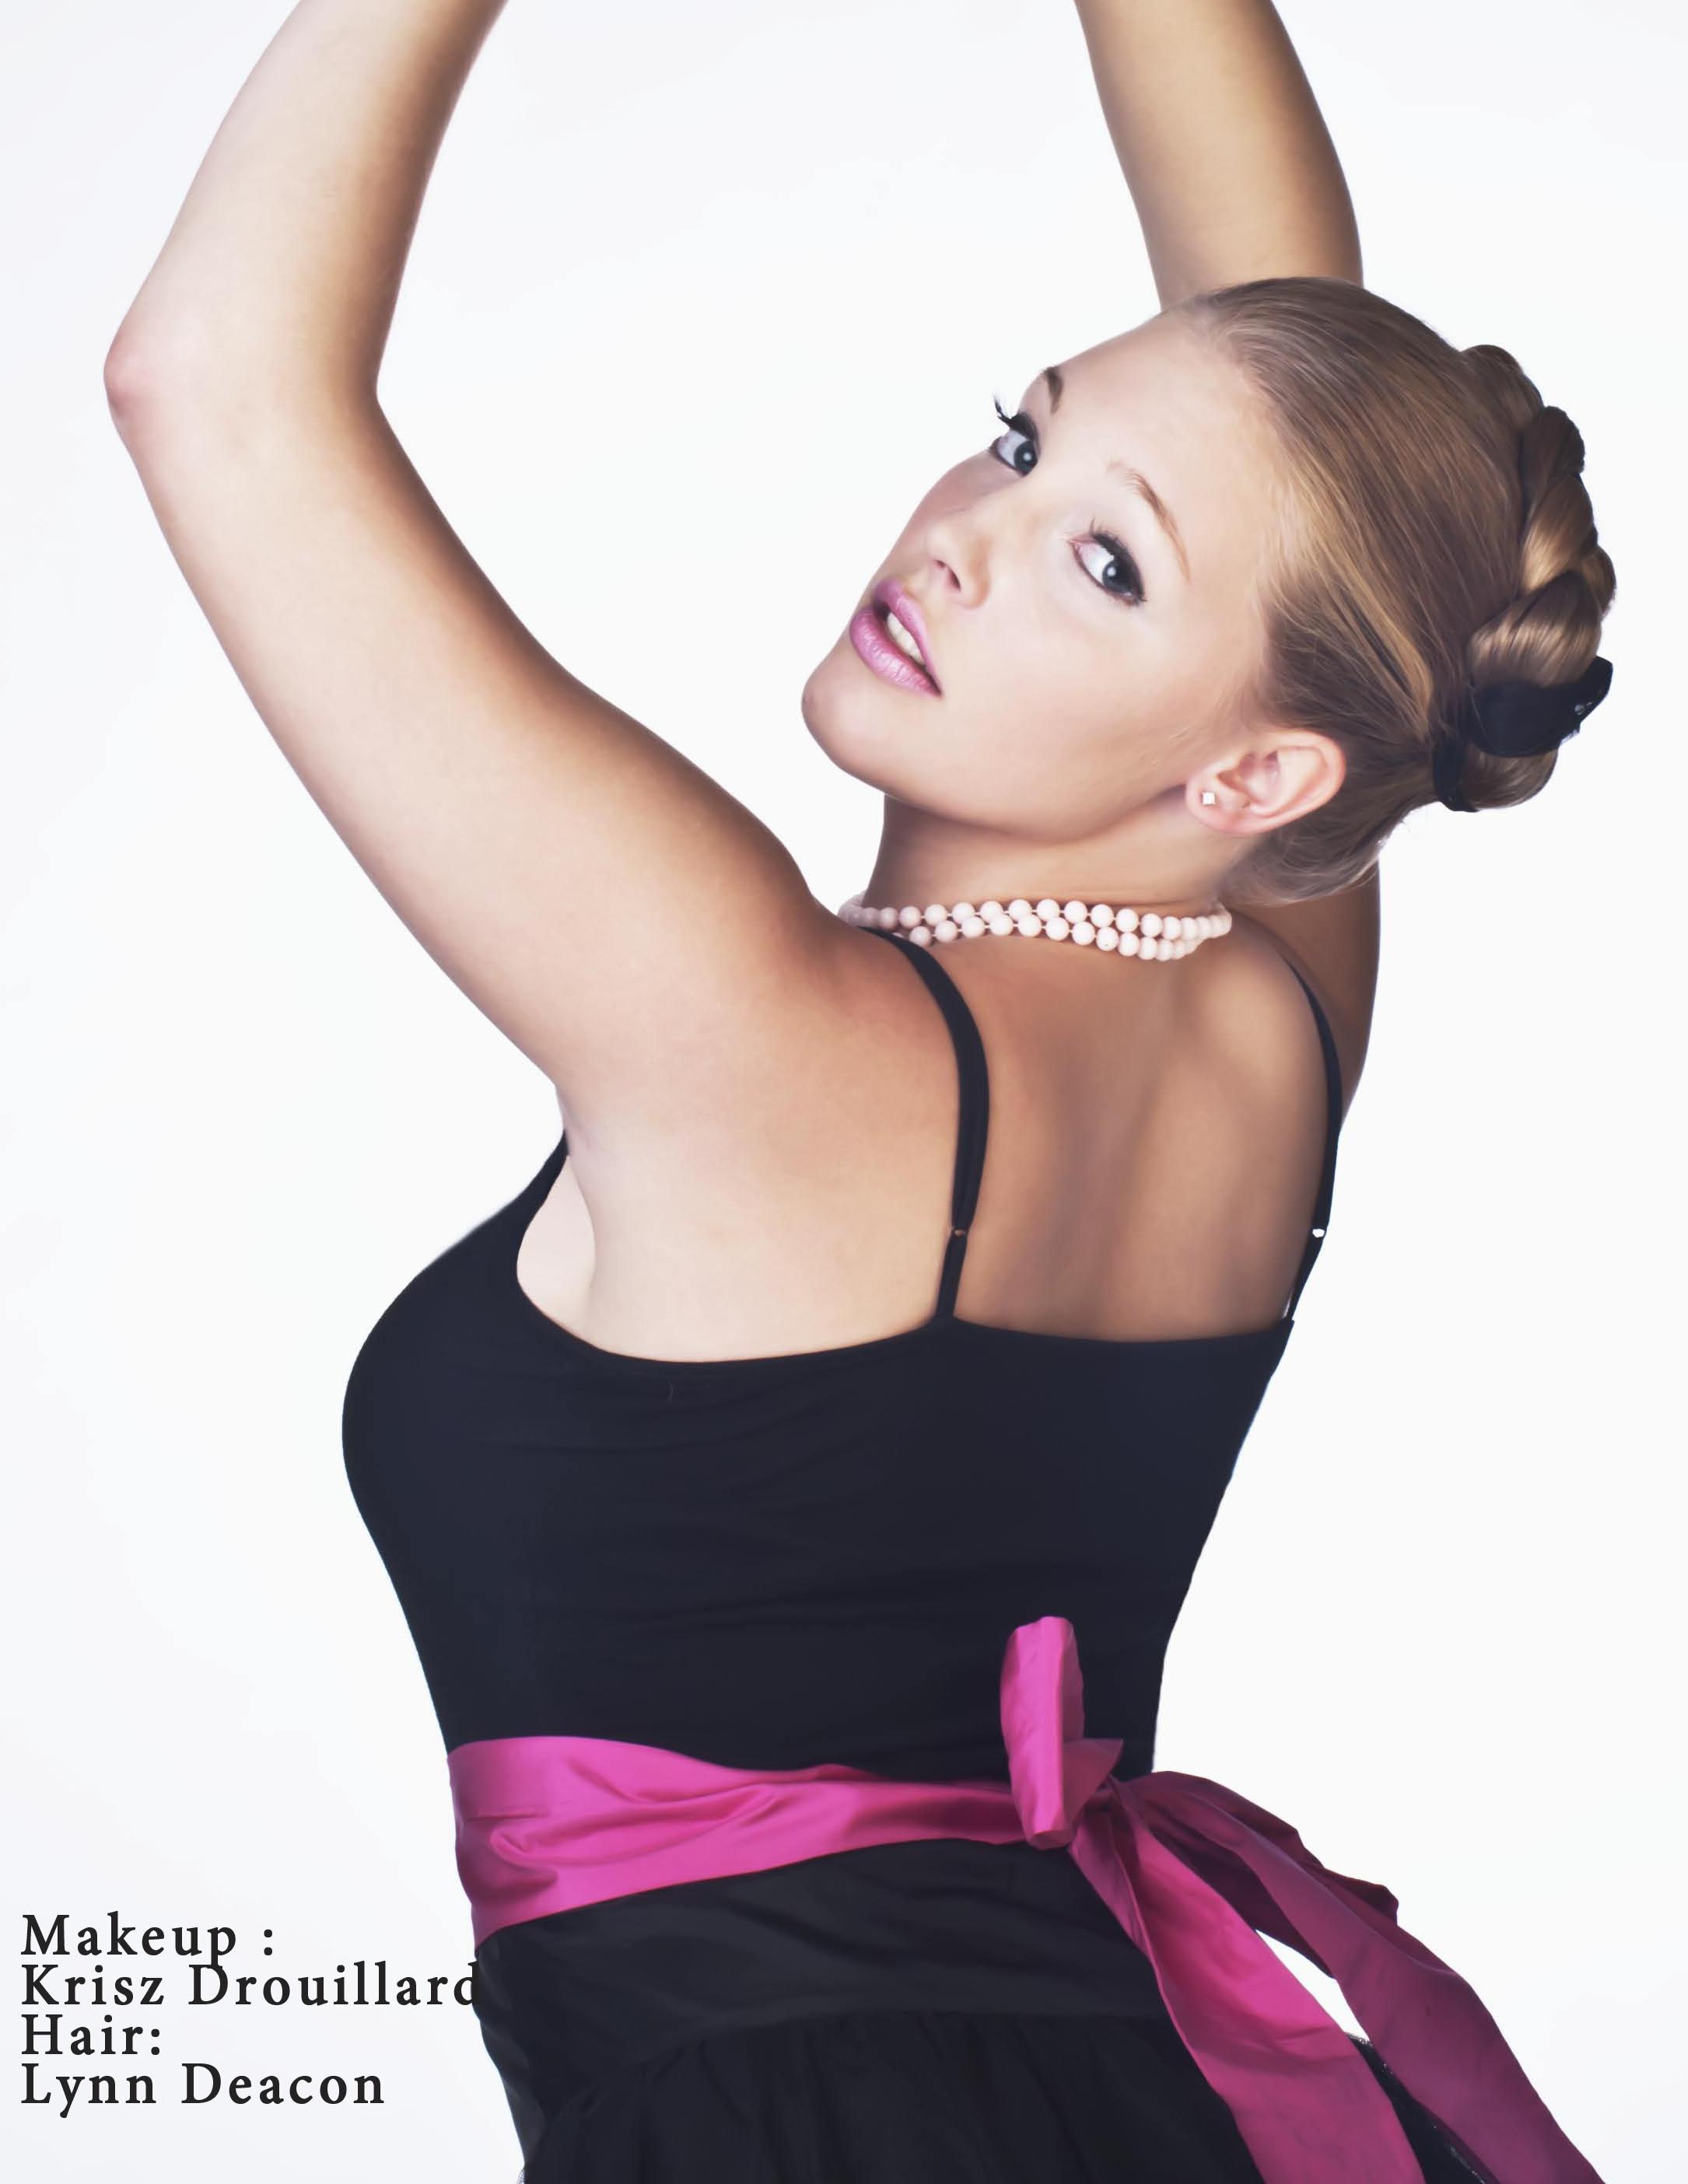 Makeup : Krisz Drouillard  Hair : Lynn Deacon